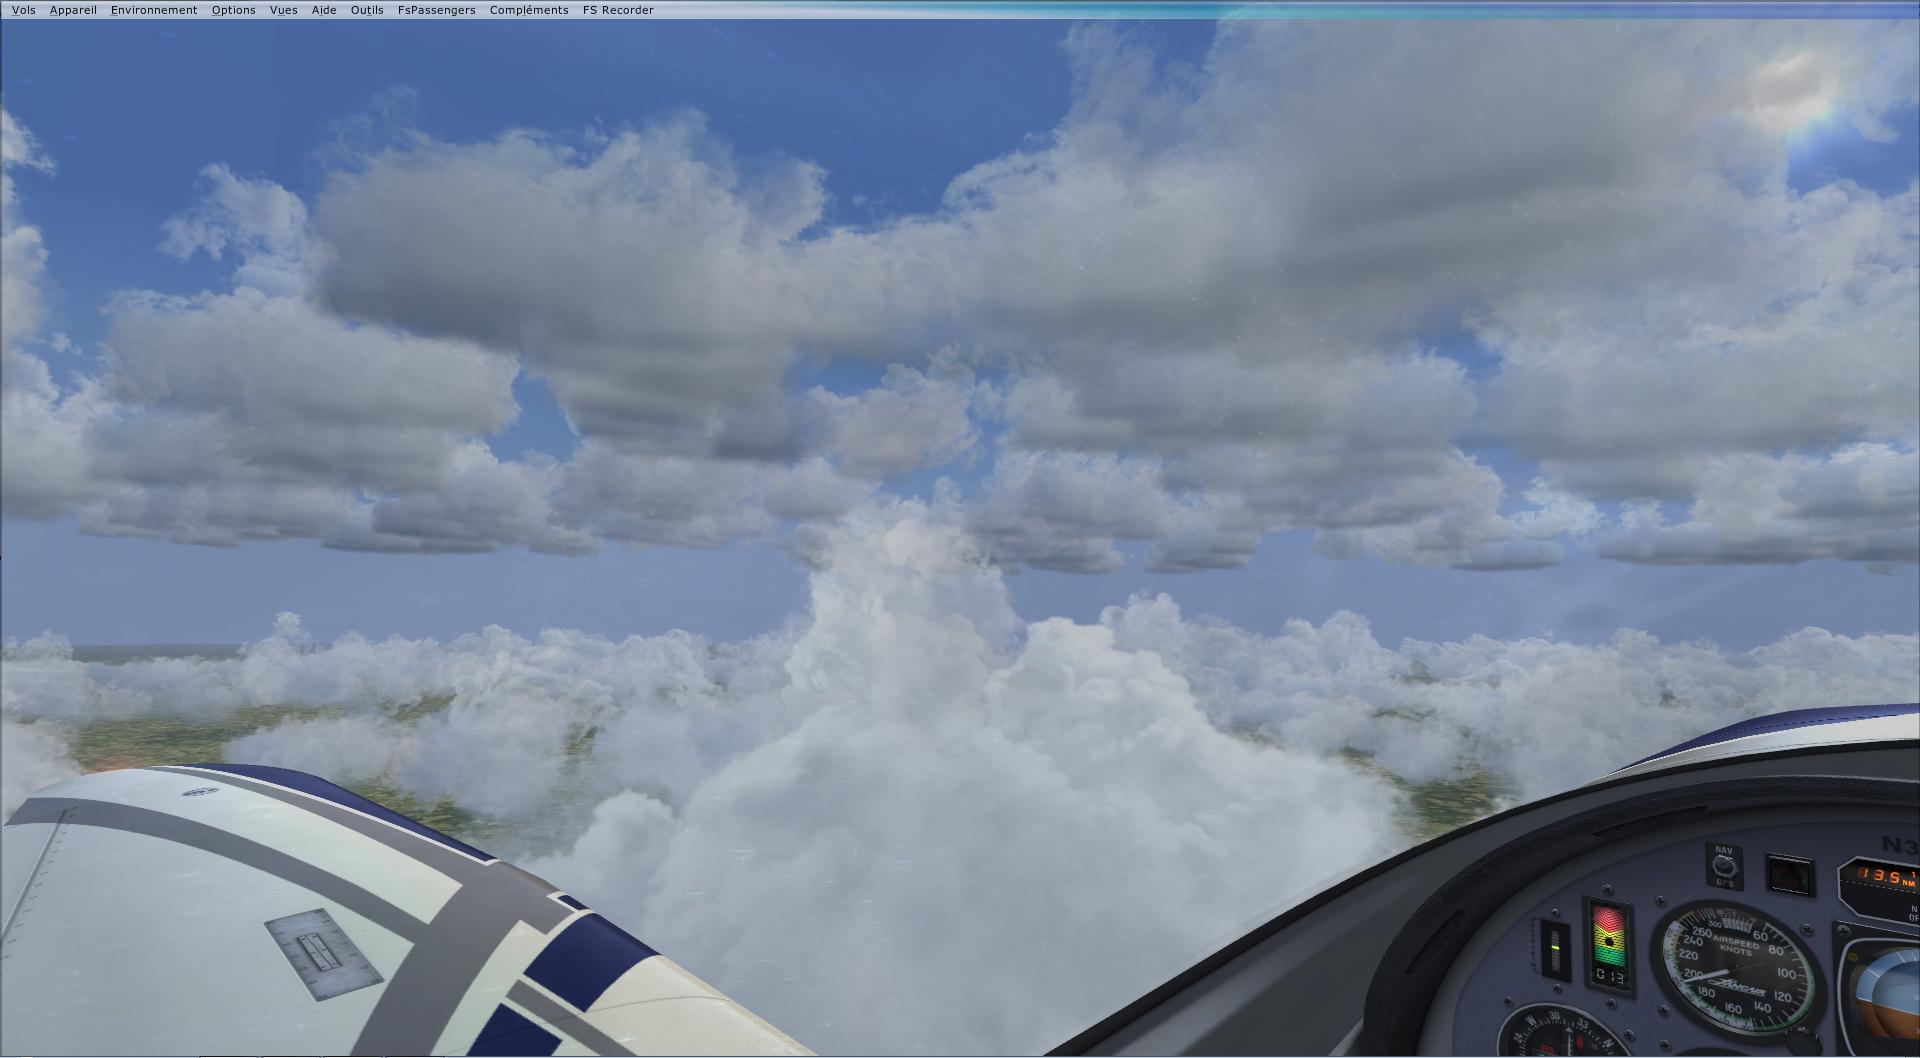 Essai demo X-Plane 10 - Page 2 92730820134718124764